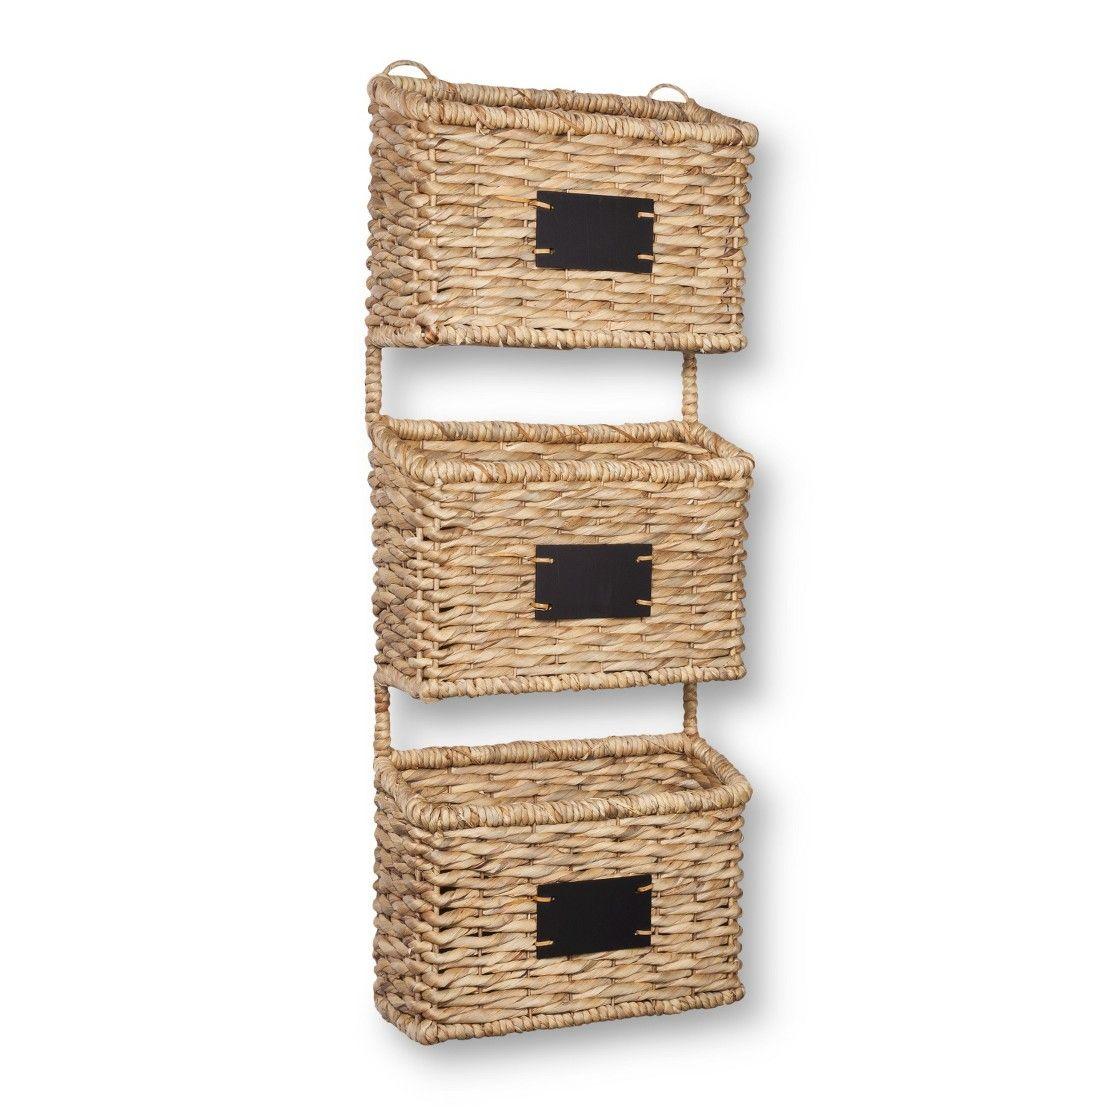 Three basket wall organizer | Home - Organization | Pinterest ...